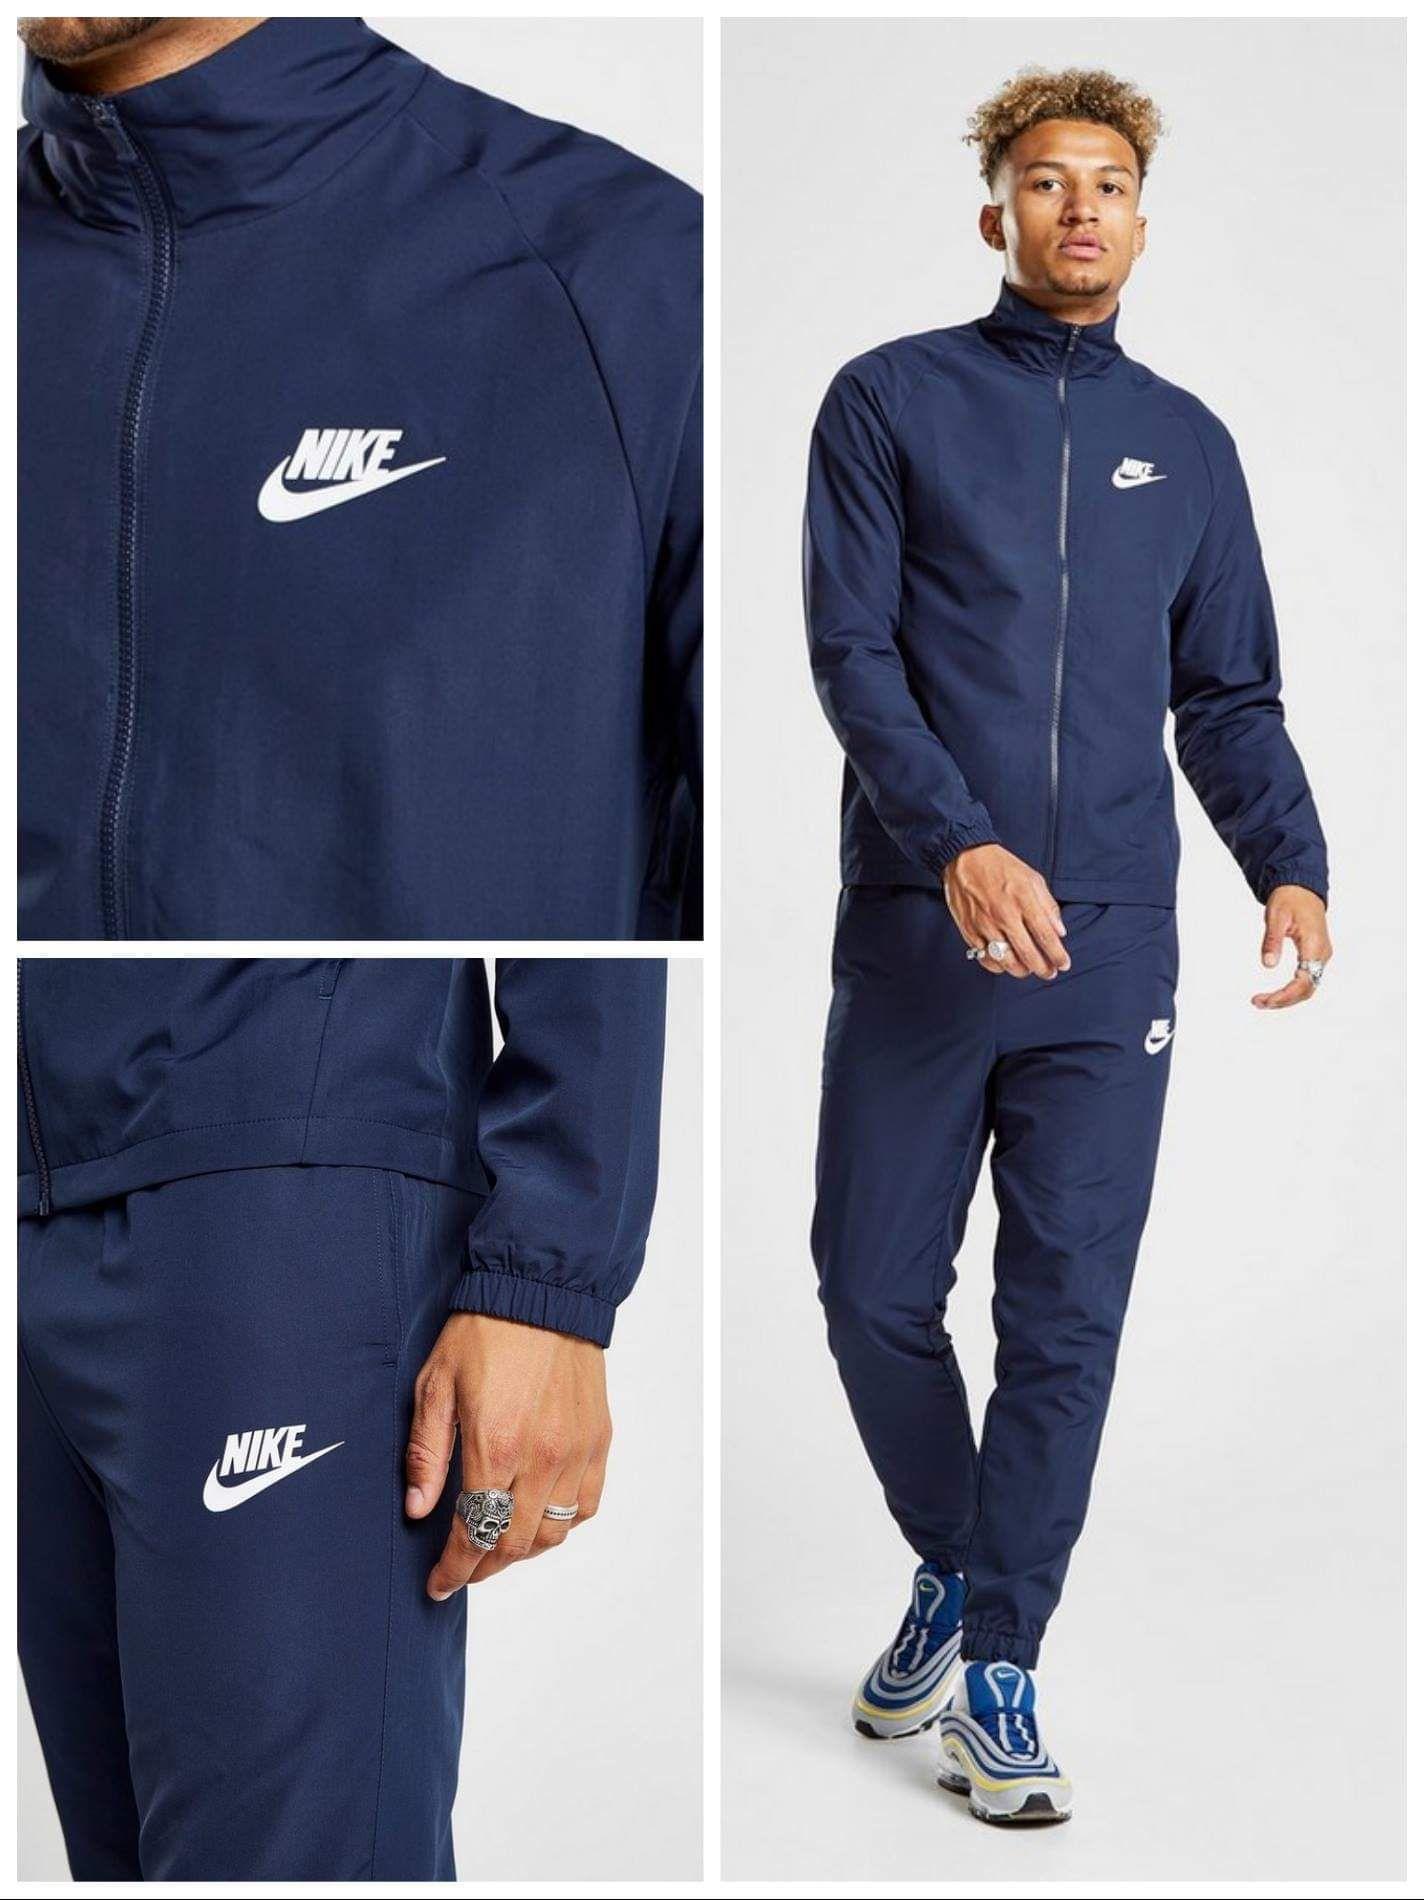 ad1f8f49f Nike Season 2 Woven Tracksuit - mydealz.de